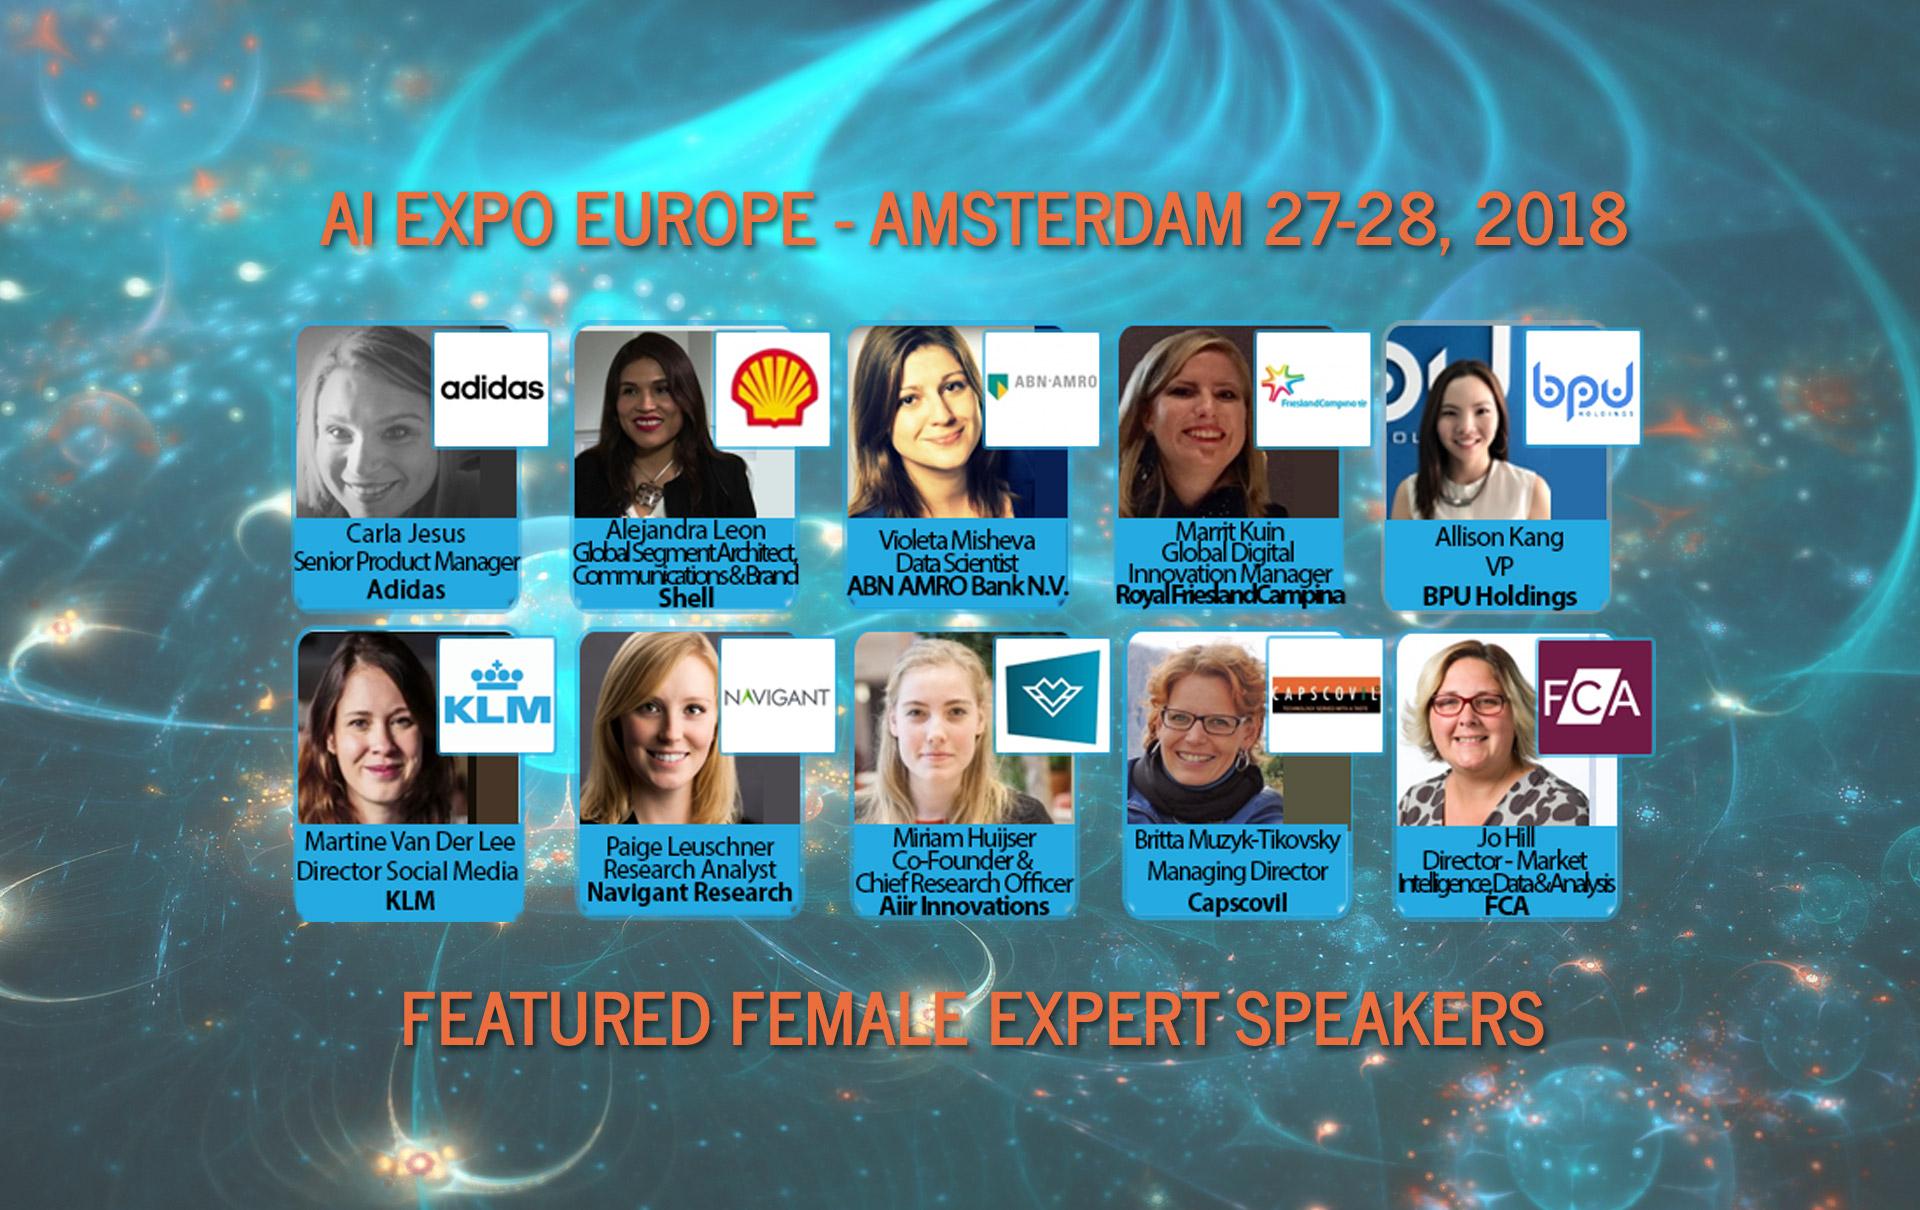 AI Expo Europe 2018 Featured Female Expert Speakers